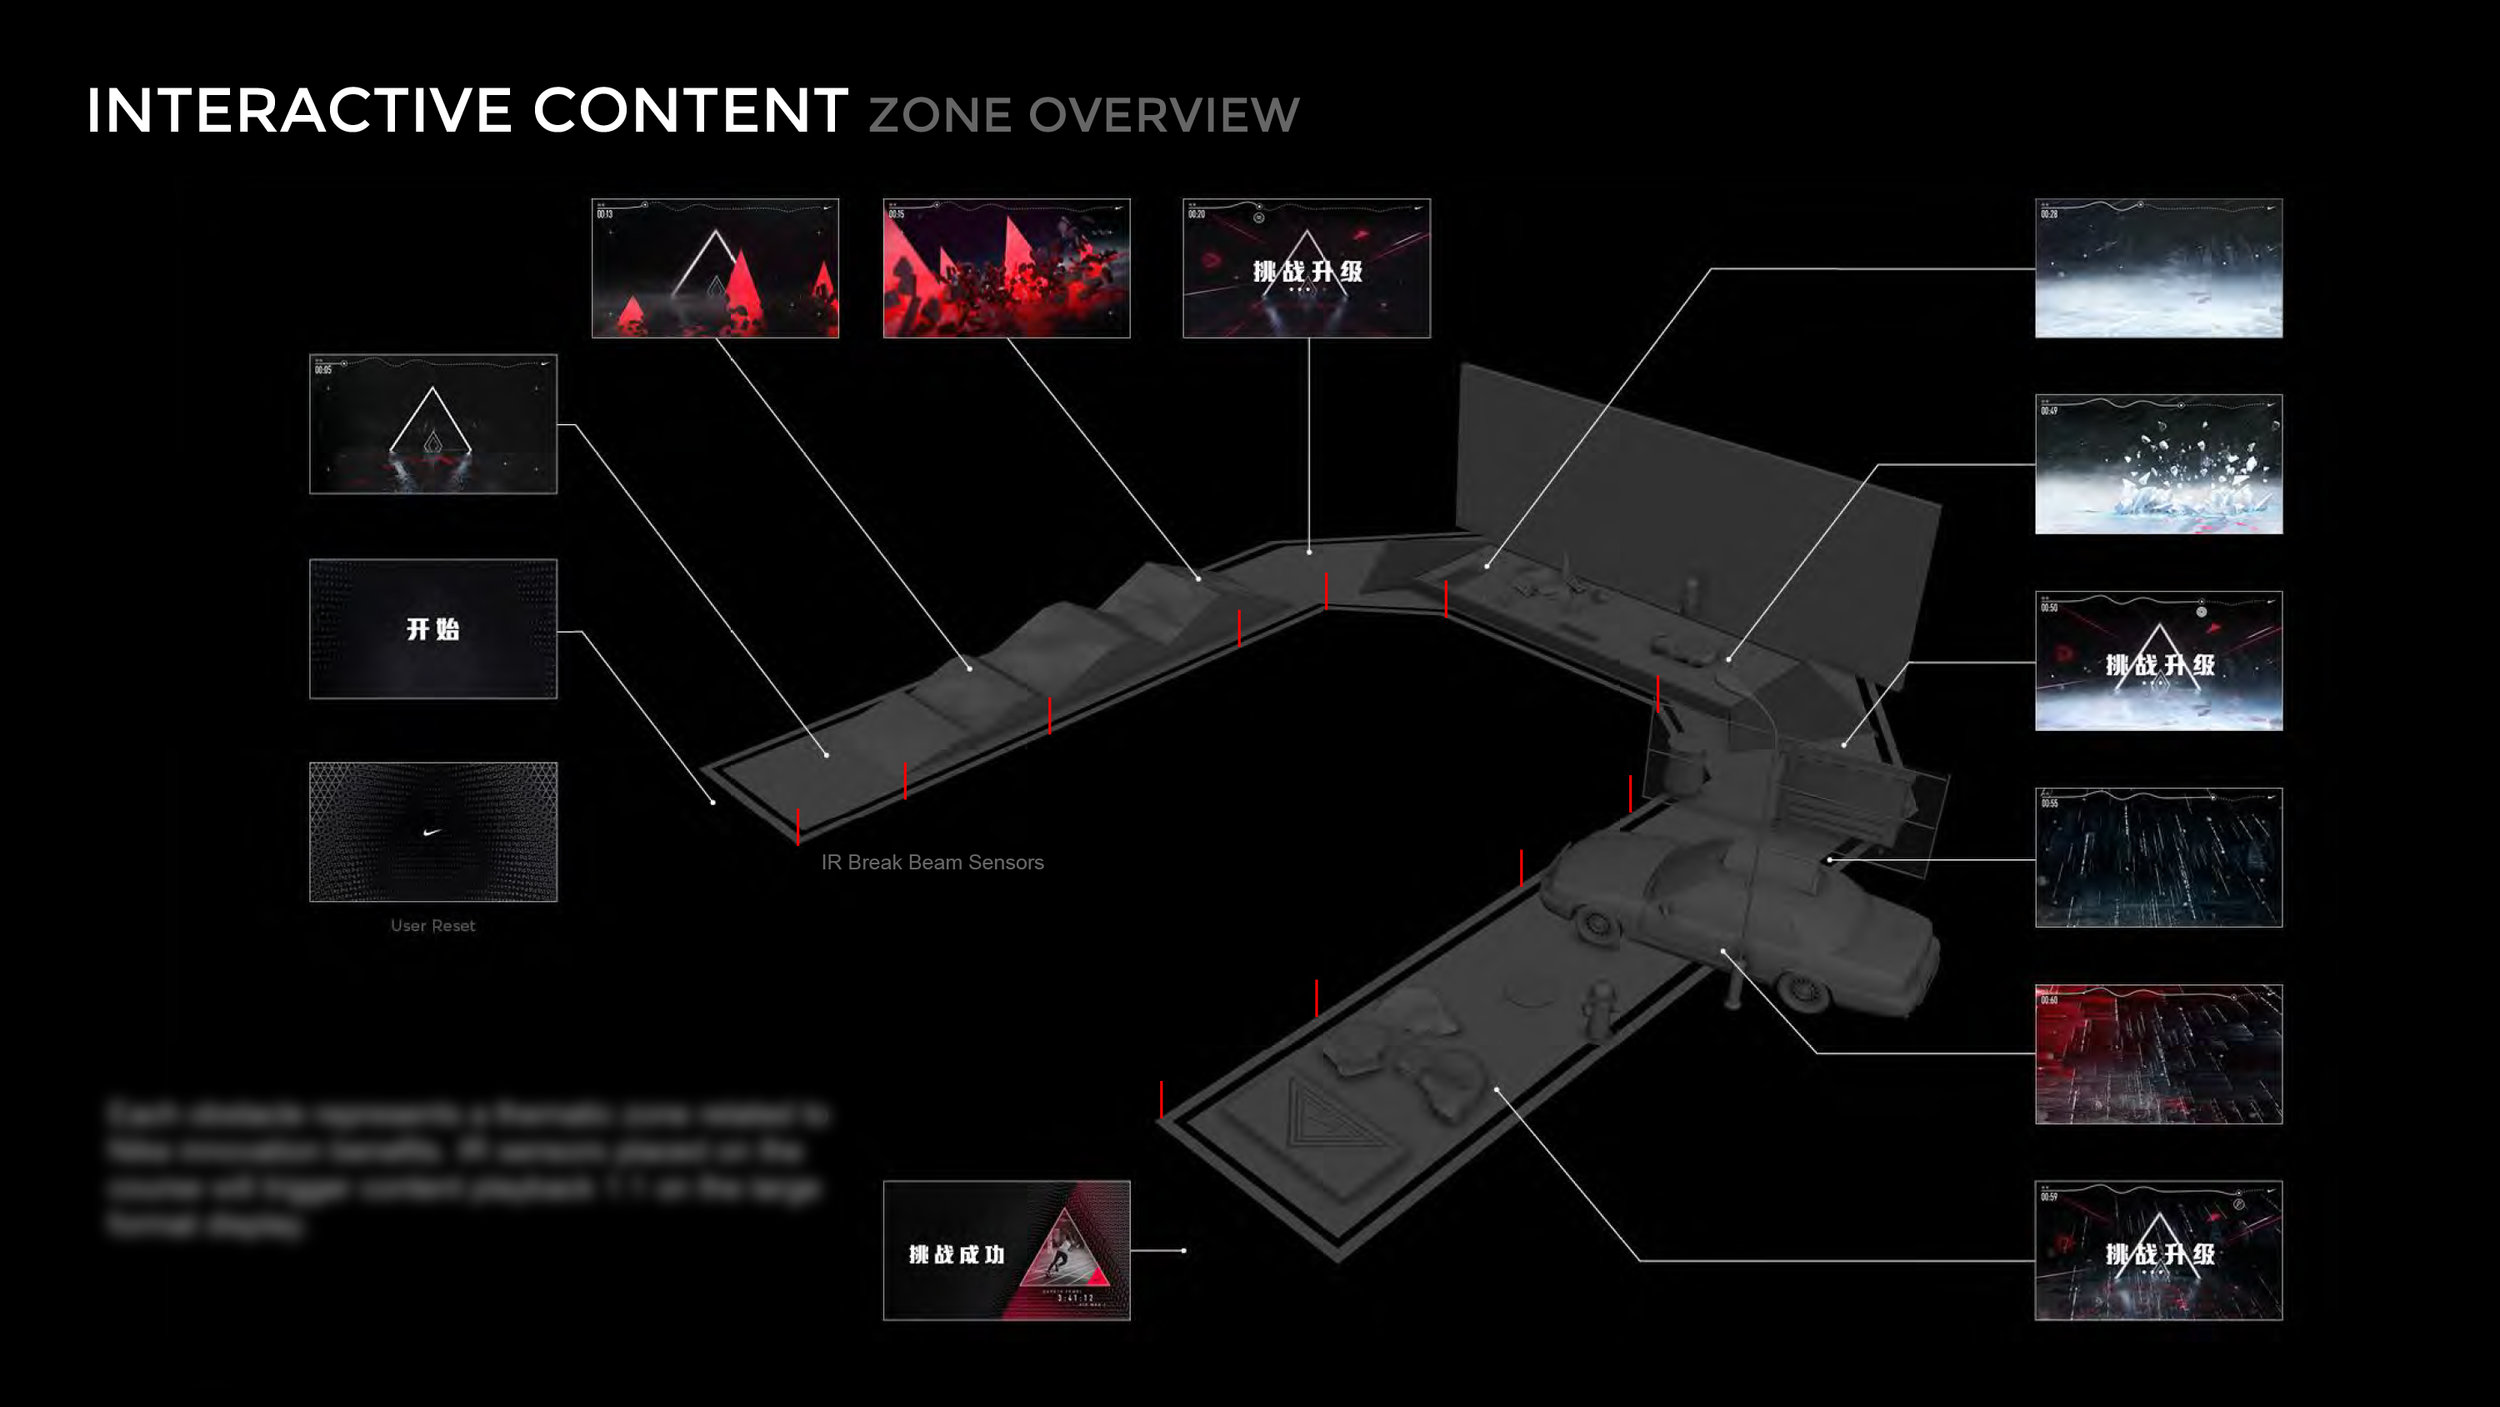 LVTHN_Nike+SneakerBoots+Digital+Content-5.jpg